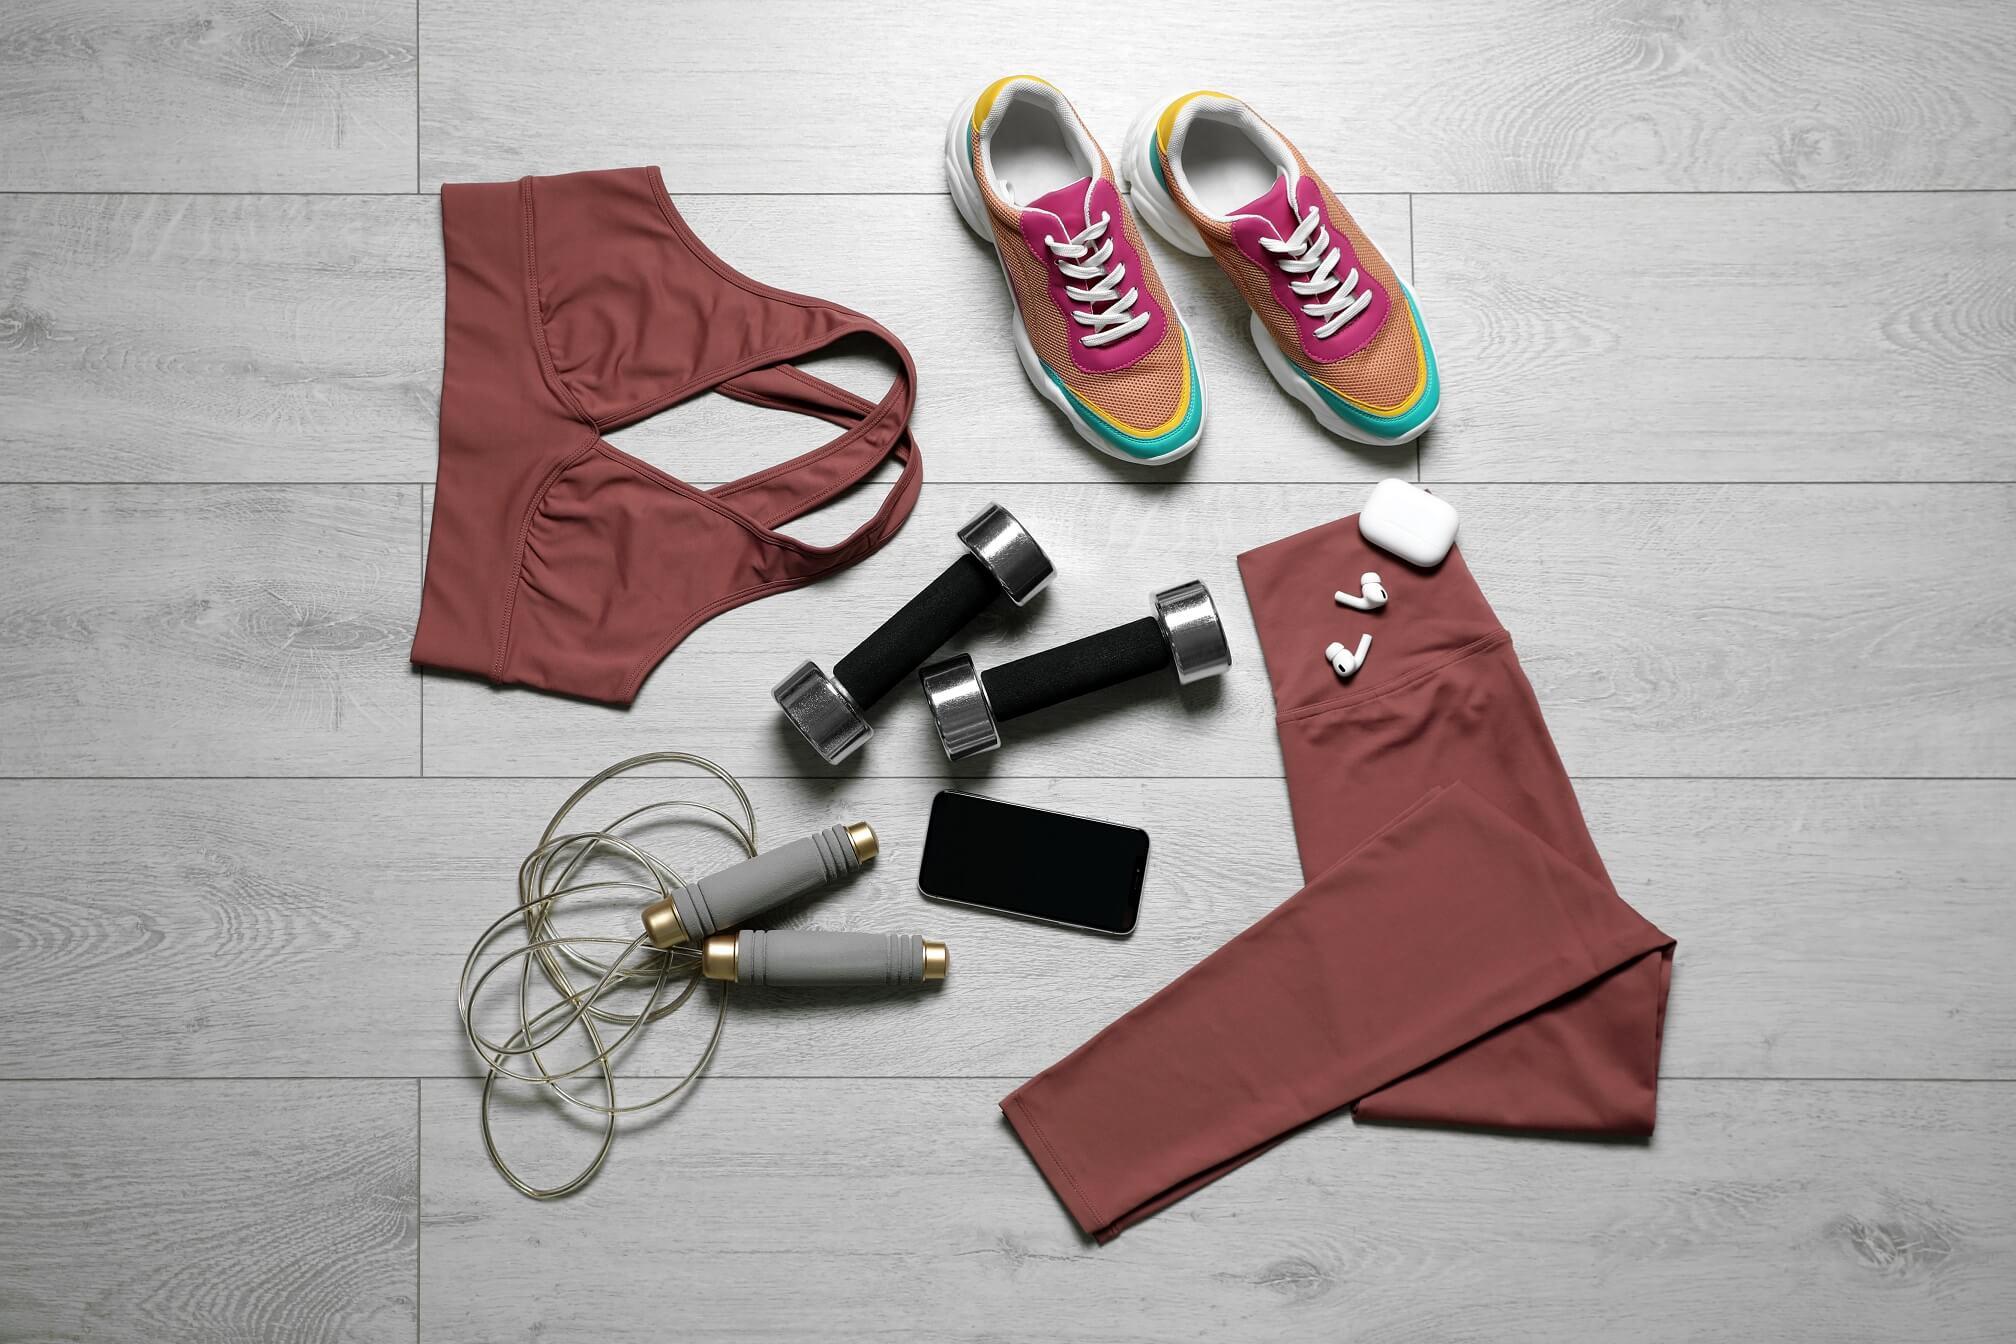 Bonpilates Ropa deportiva 1 - Ropa recomendada para practicar pilates